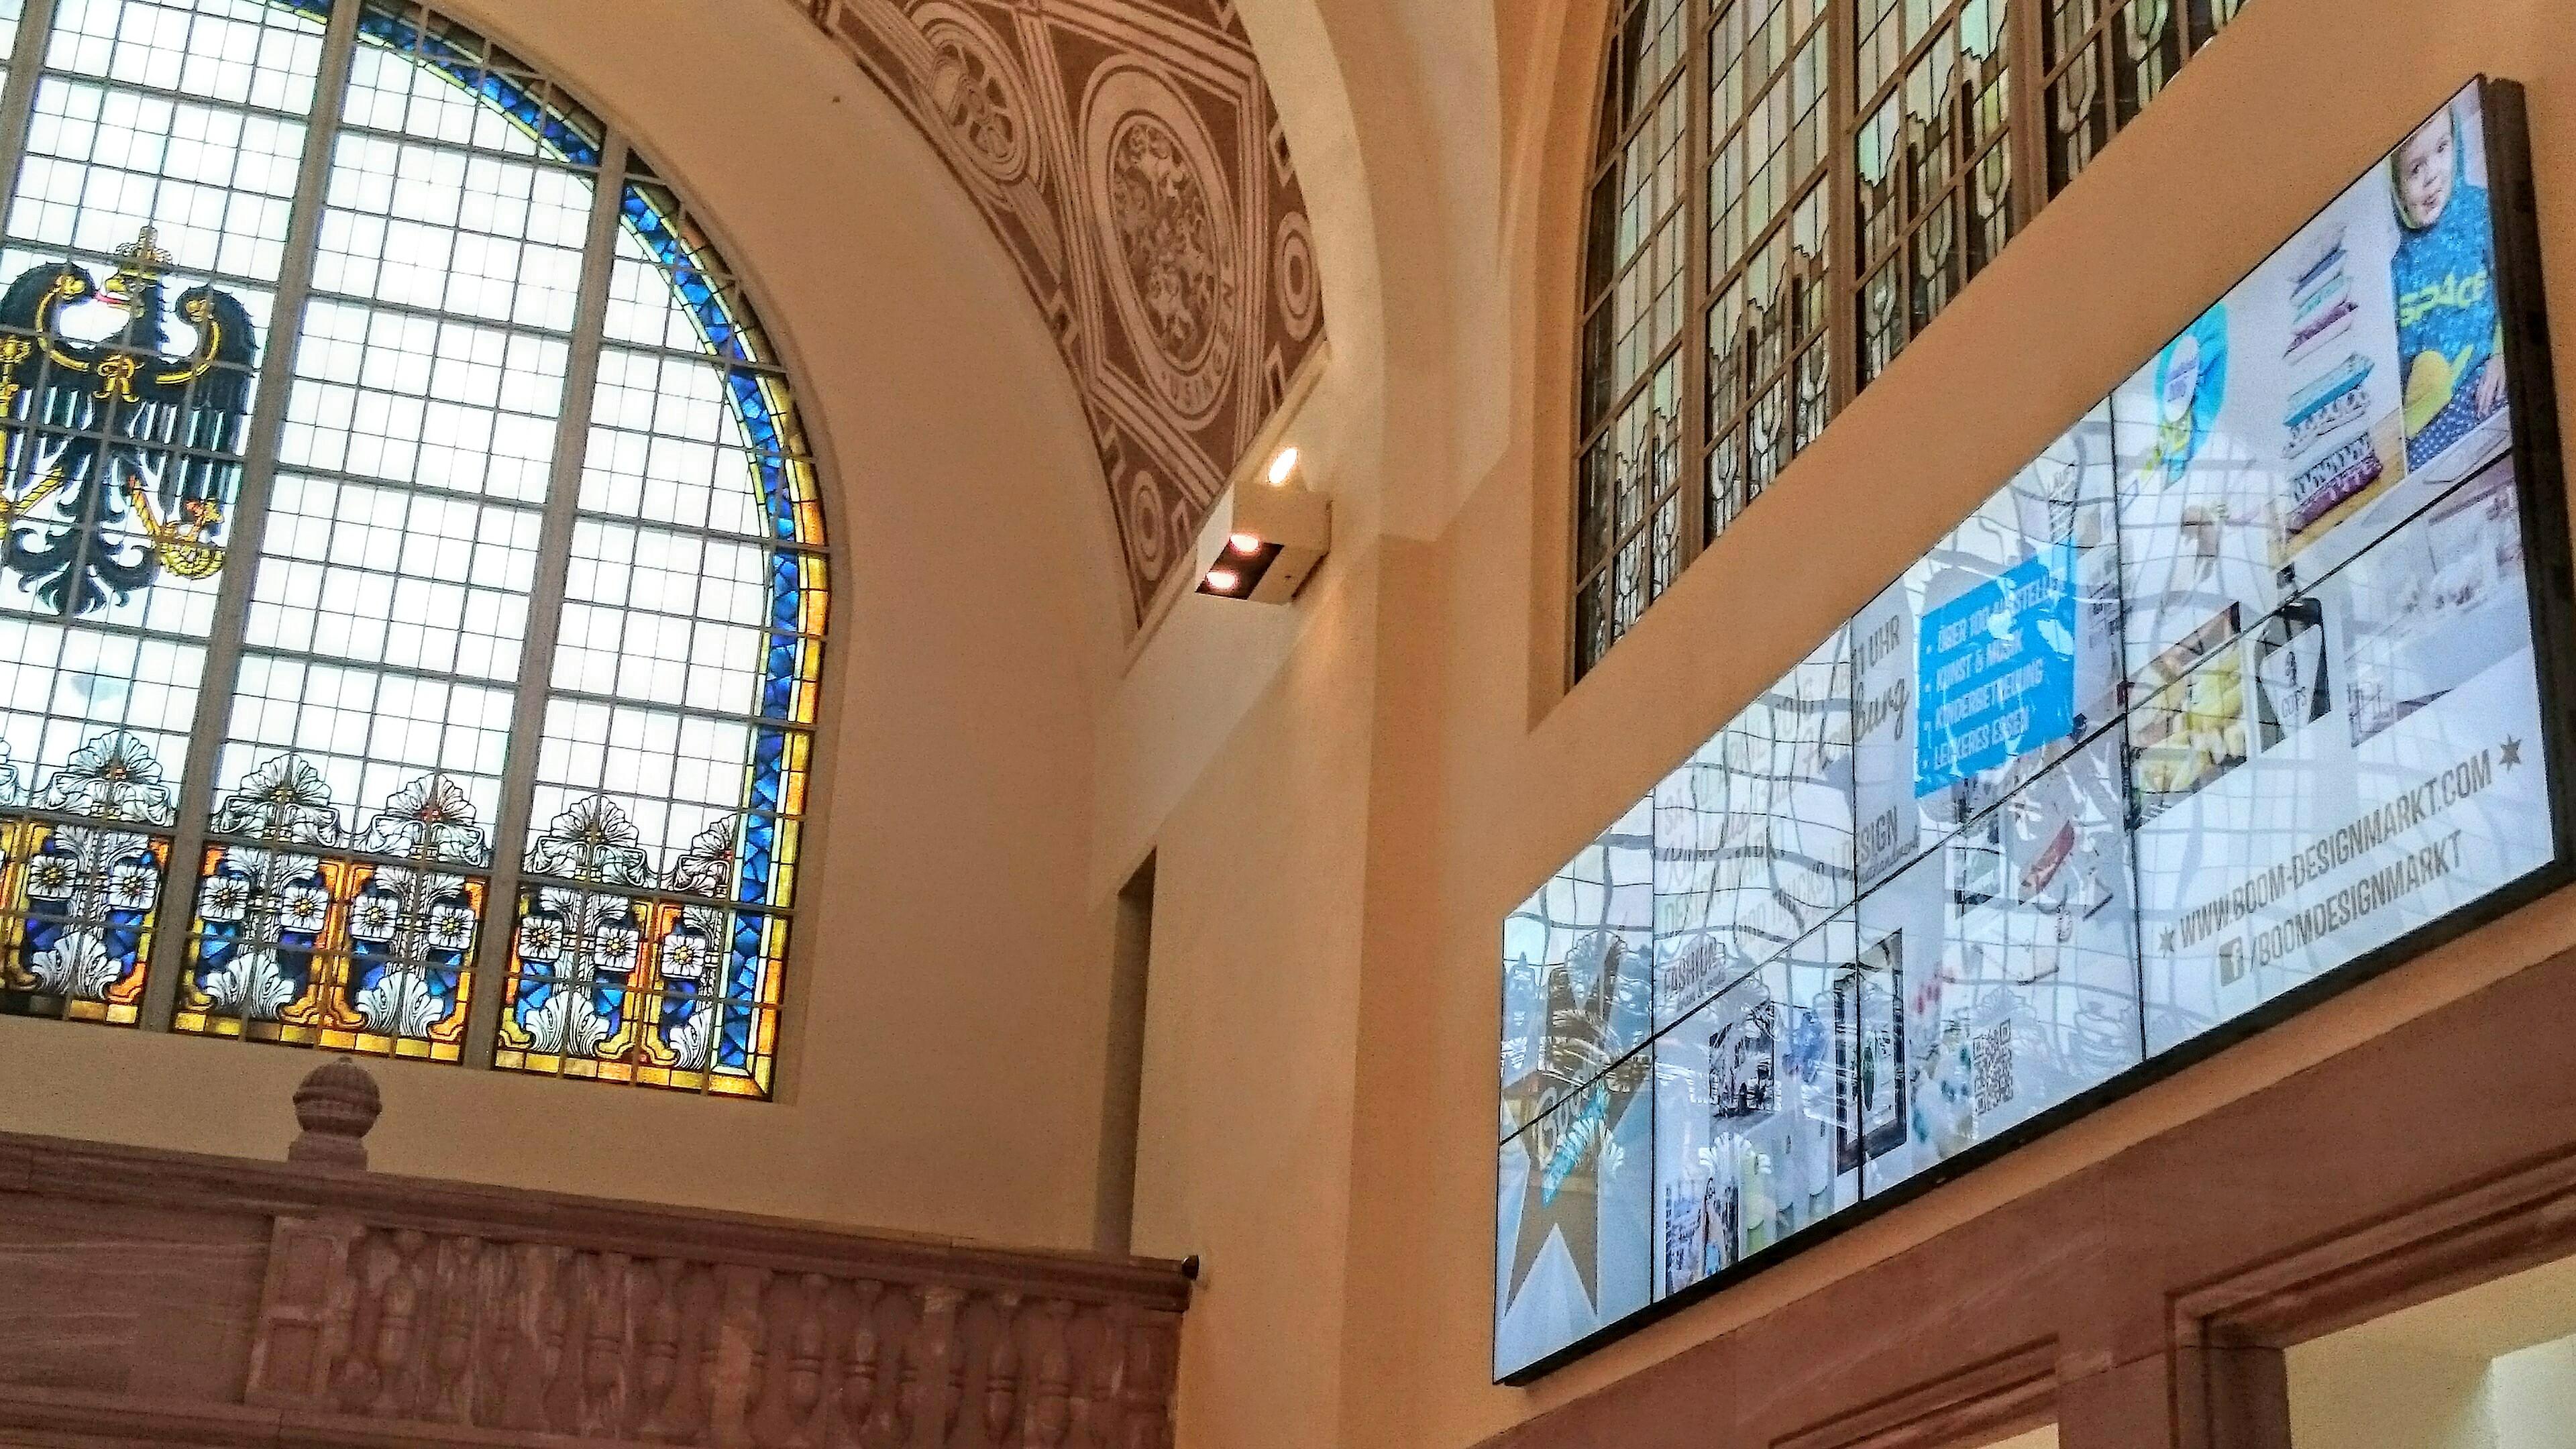 Videowerbung im Bahnhof Bad Homburg